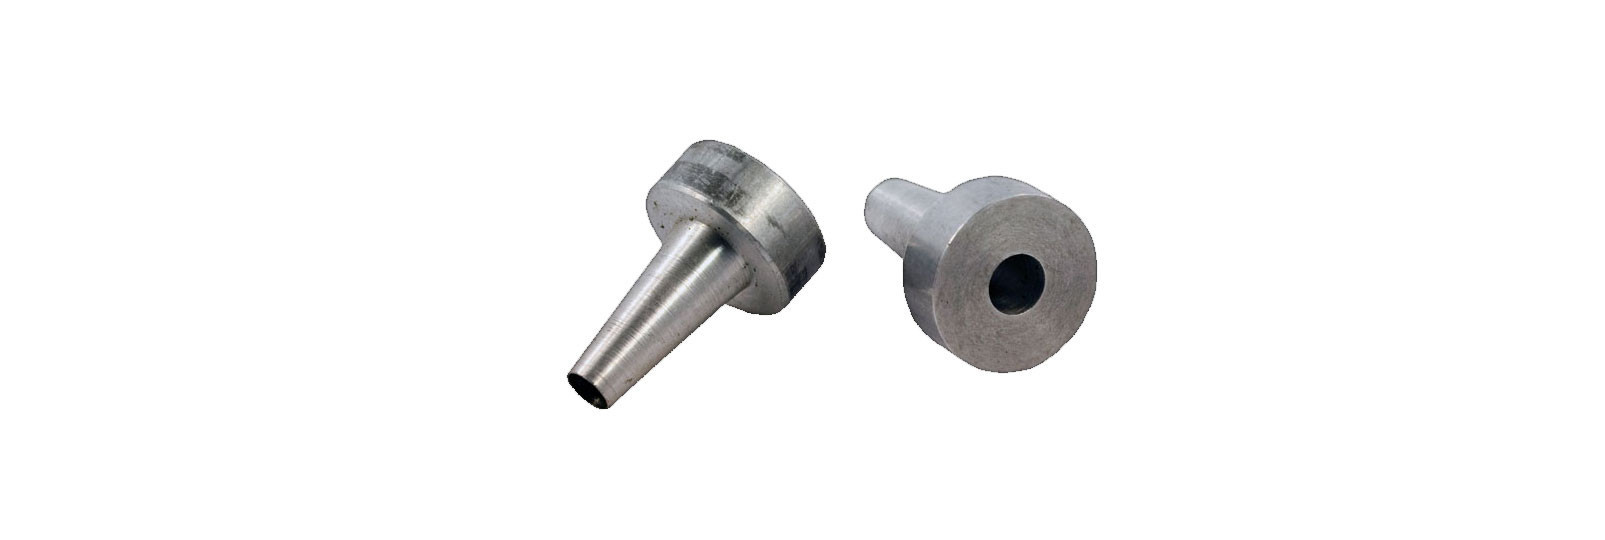 Salvabocca in alluminio